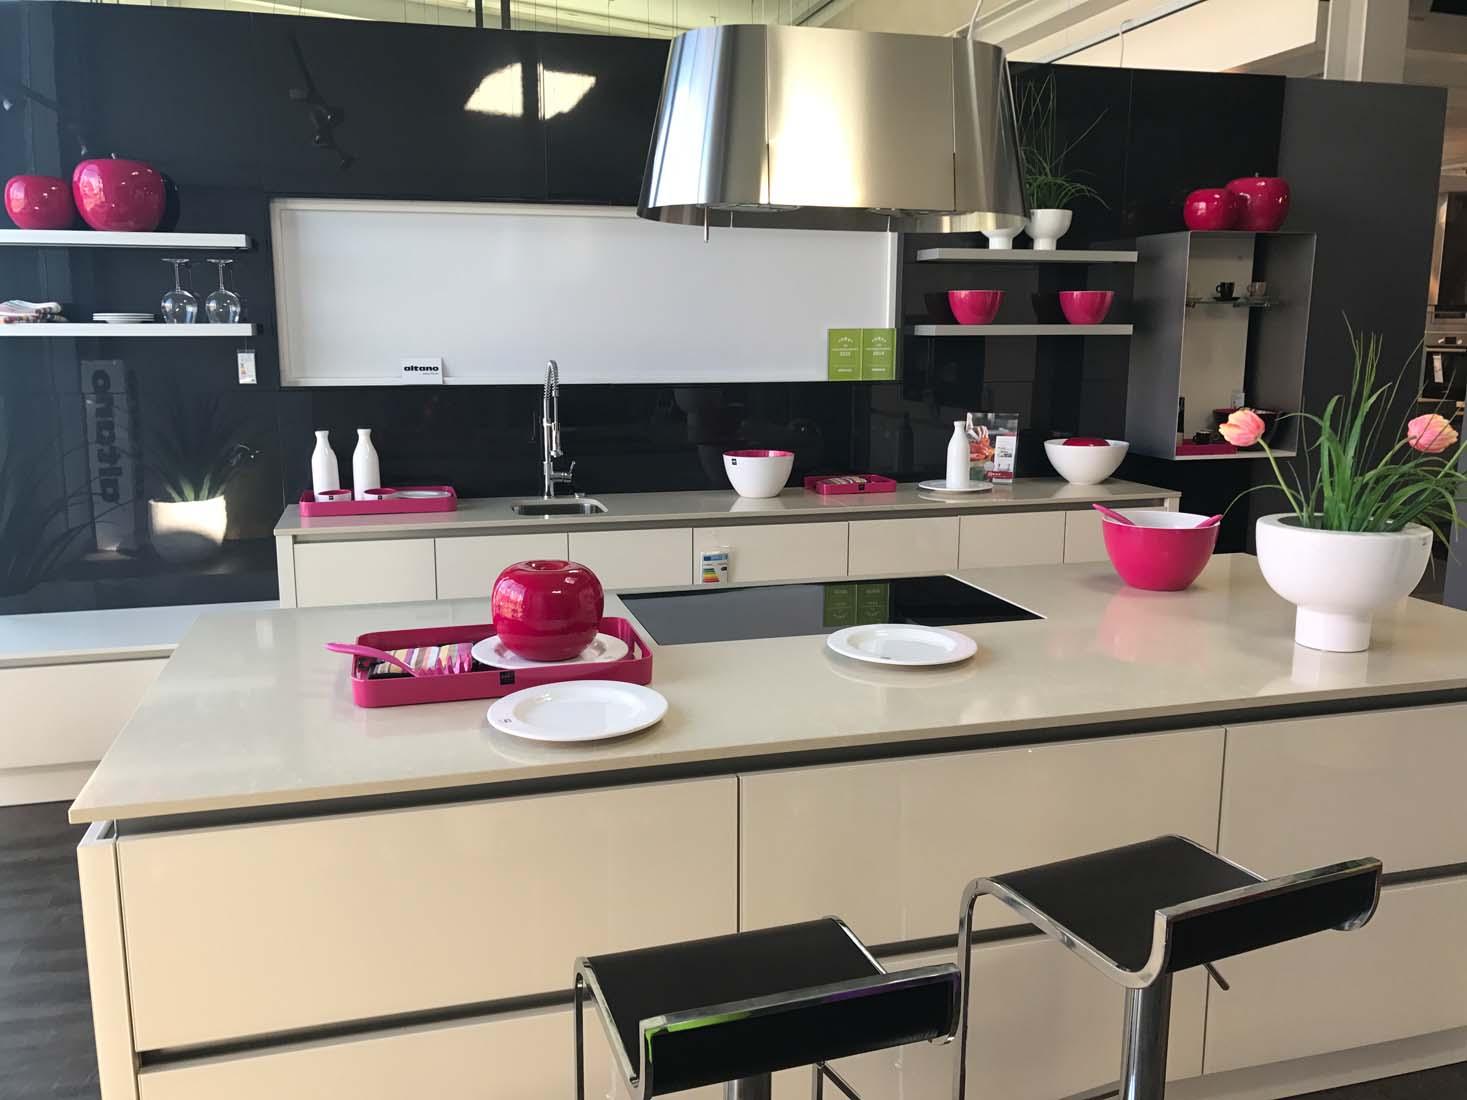 kchen darmstadt great komplette kche with kchen darmstadt. Black Bedroom Furniture Sets. Home Design Ideas